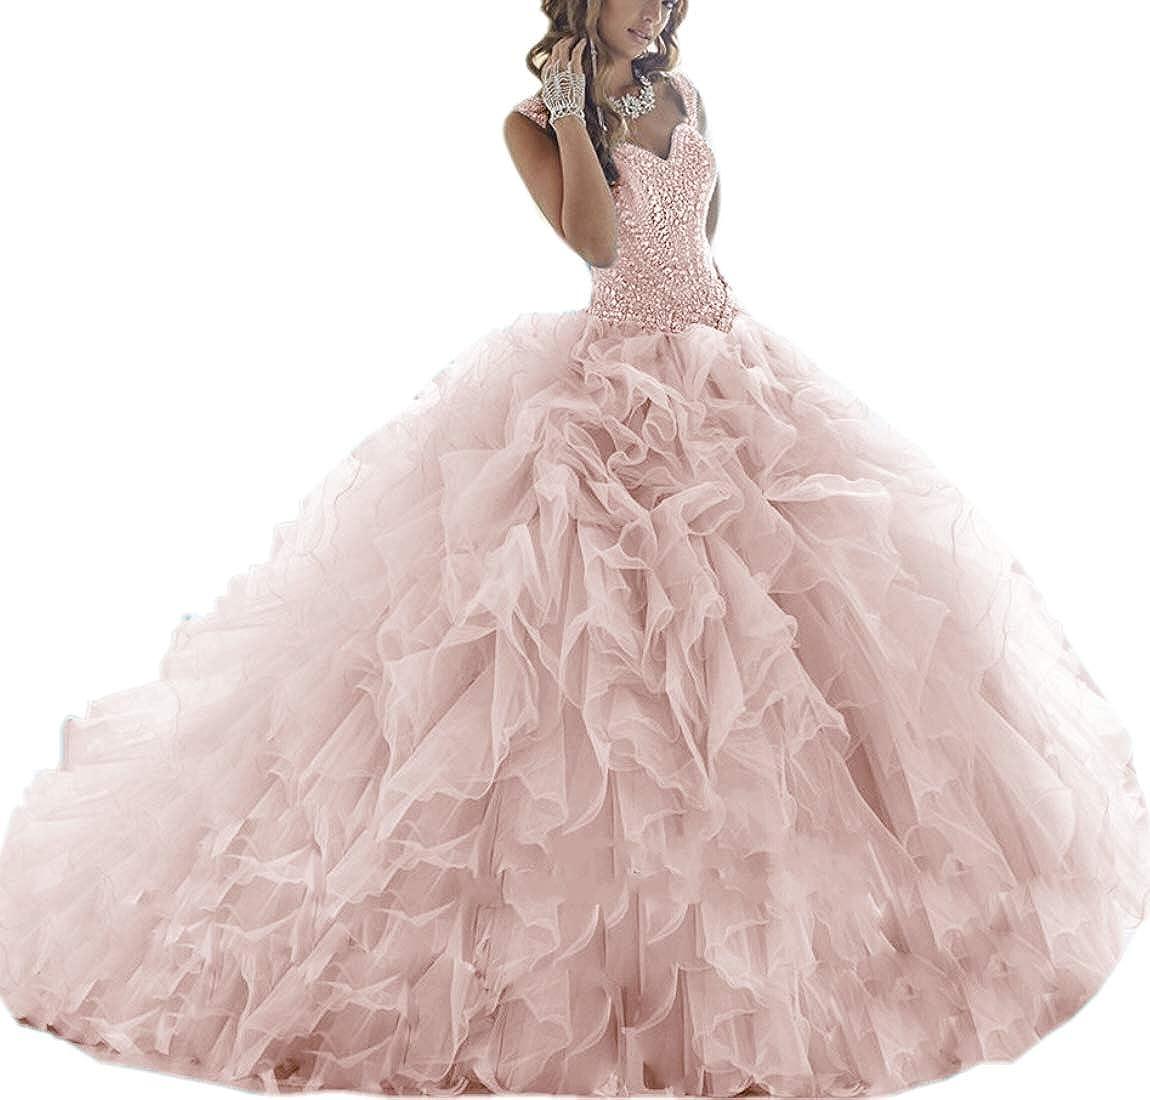 bluesh APXPF Women's Crystals Beaded Organza Ruffle Quinceanera Dress Sweet 16 Ball Gown Prom Dress